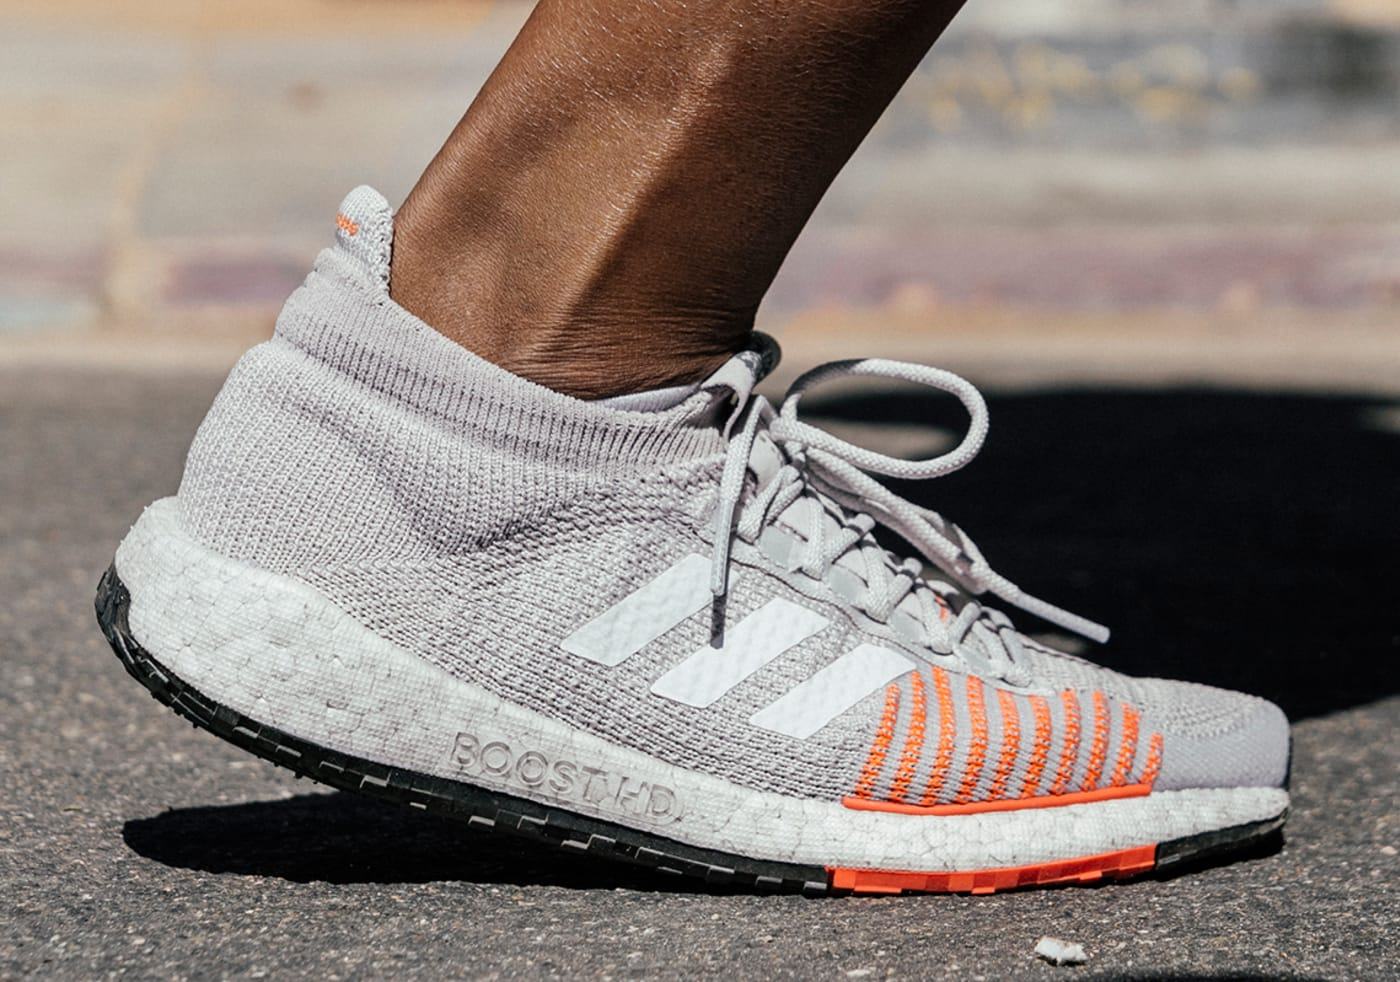 adidas boost hd pulseboost release date 8 1